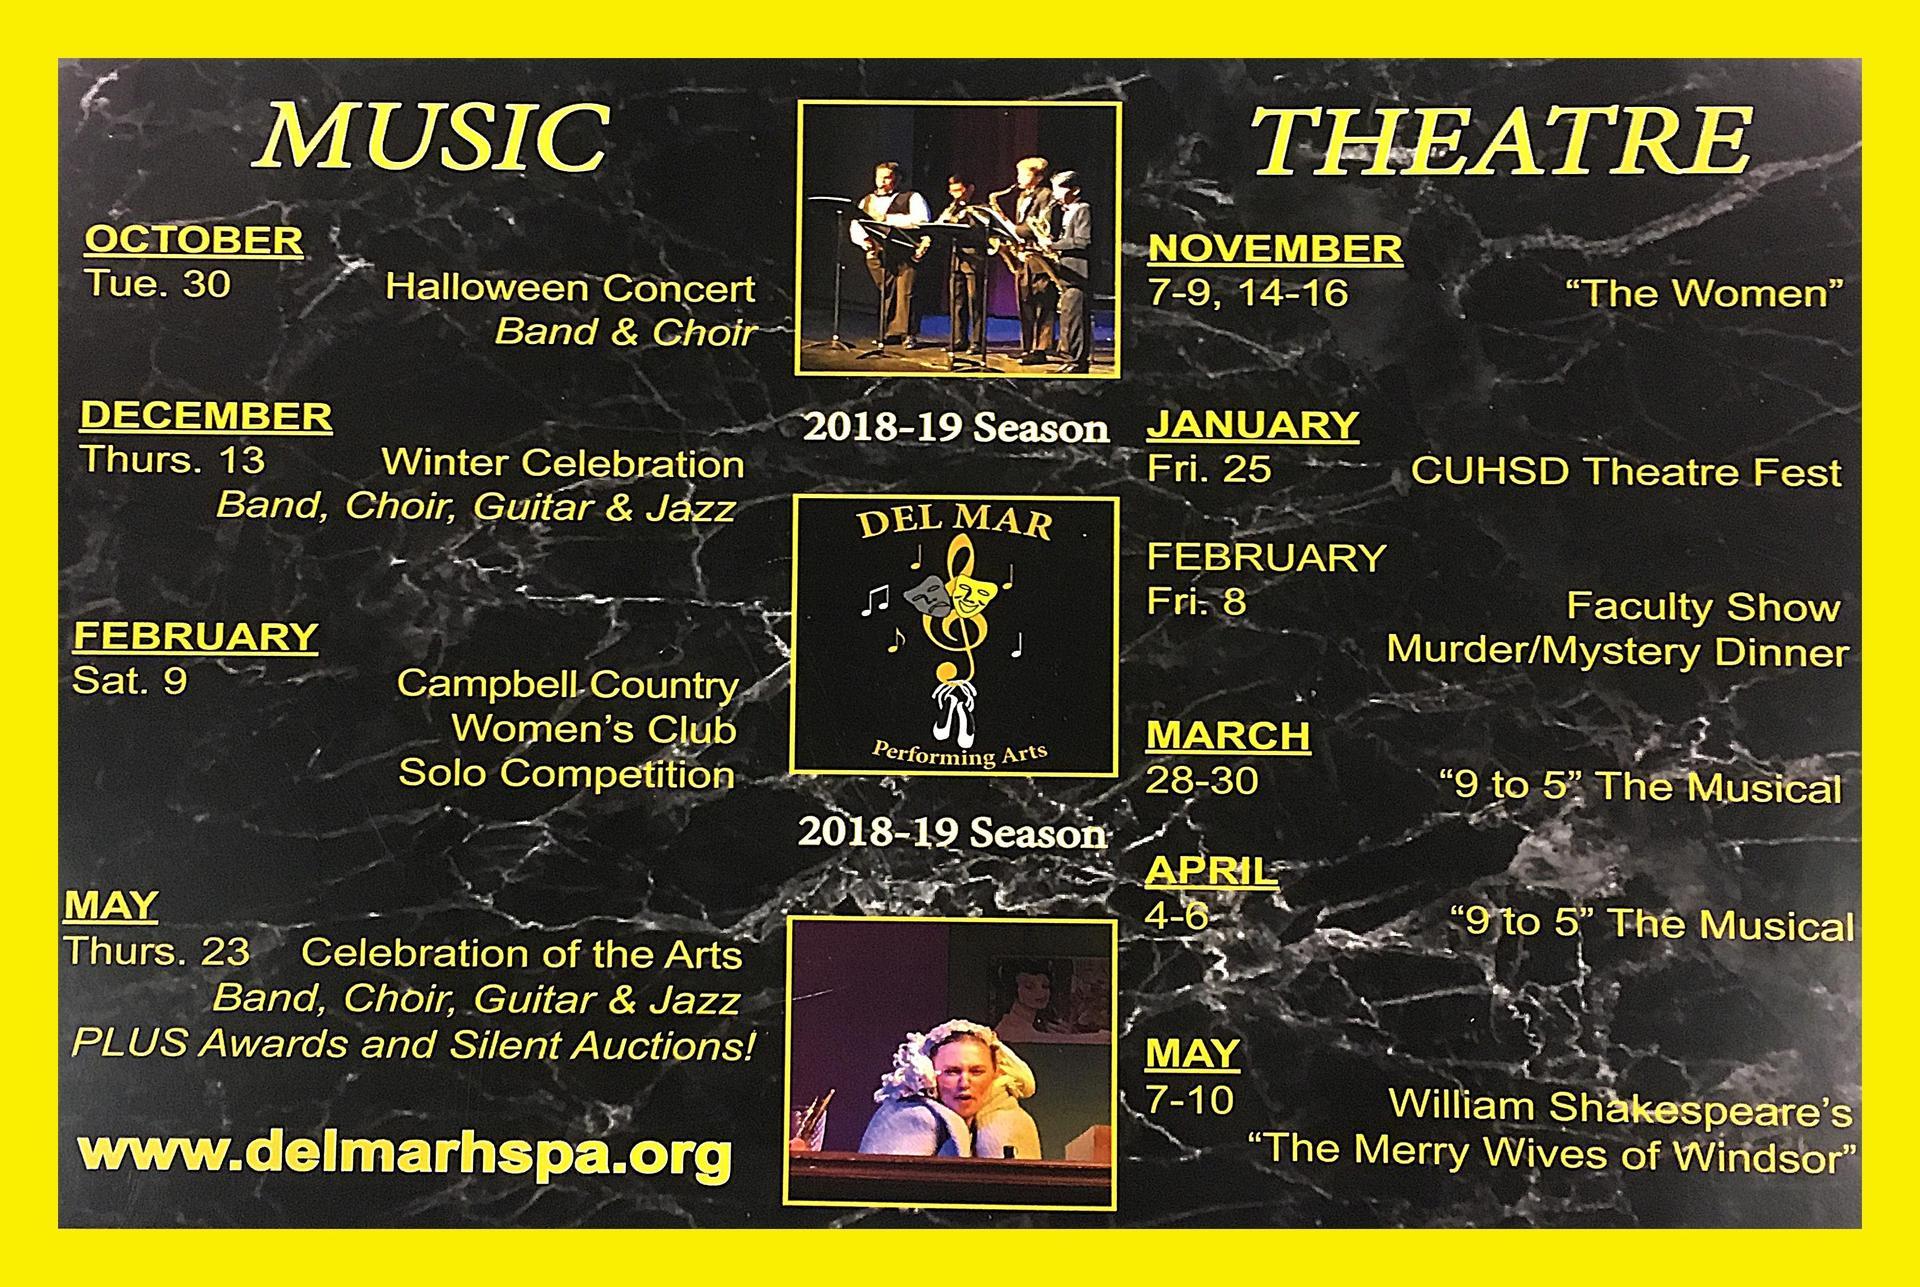 Image of 2018-19 Performing Arts Productions at Del Mar